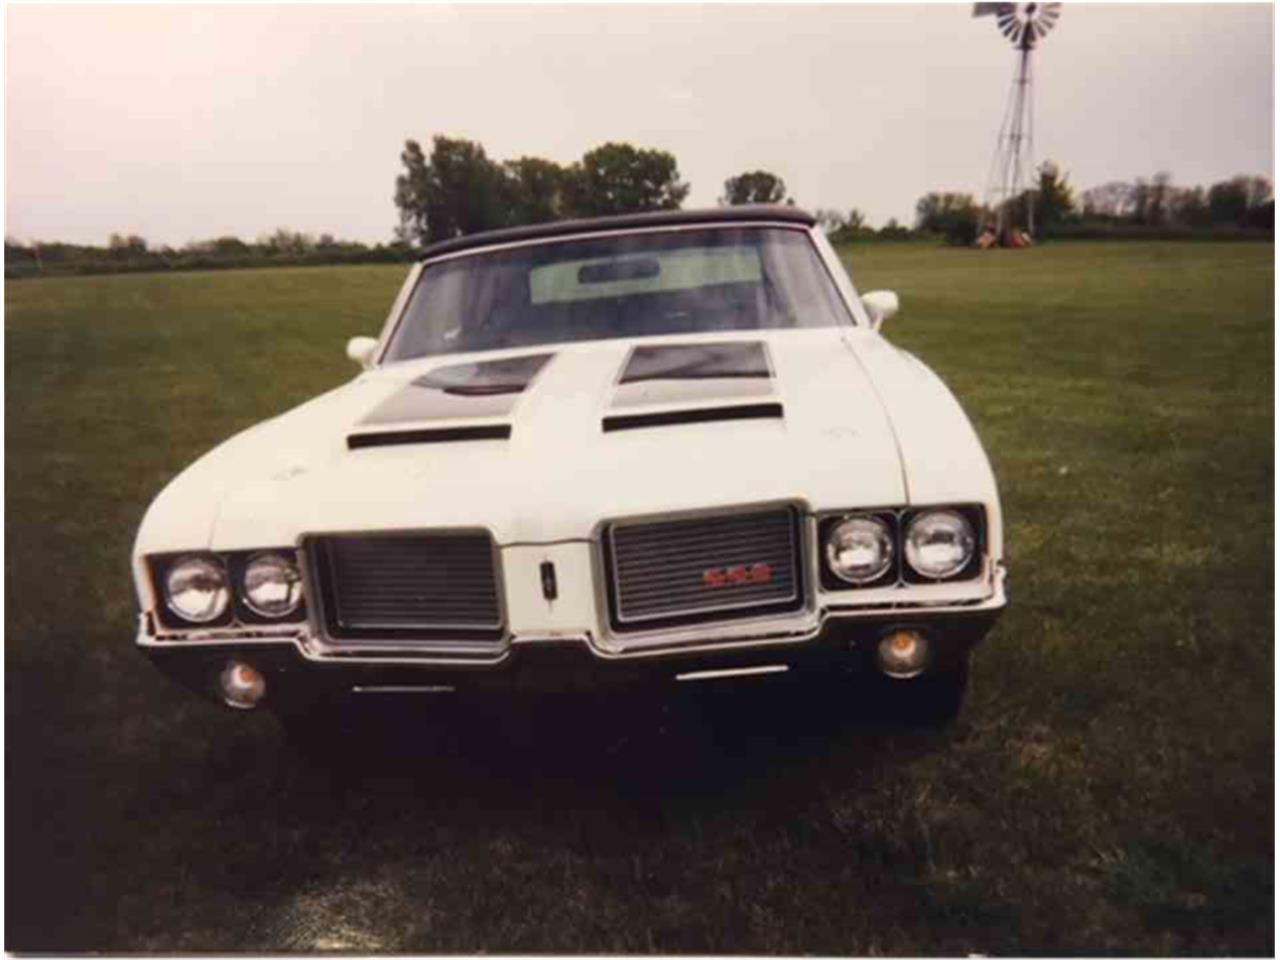 Large Picture of Classic '72 Cutlass Supreme located in Michigan - $49,500.00 - MXYX